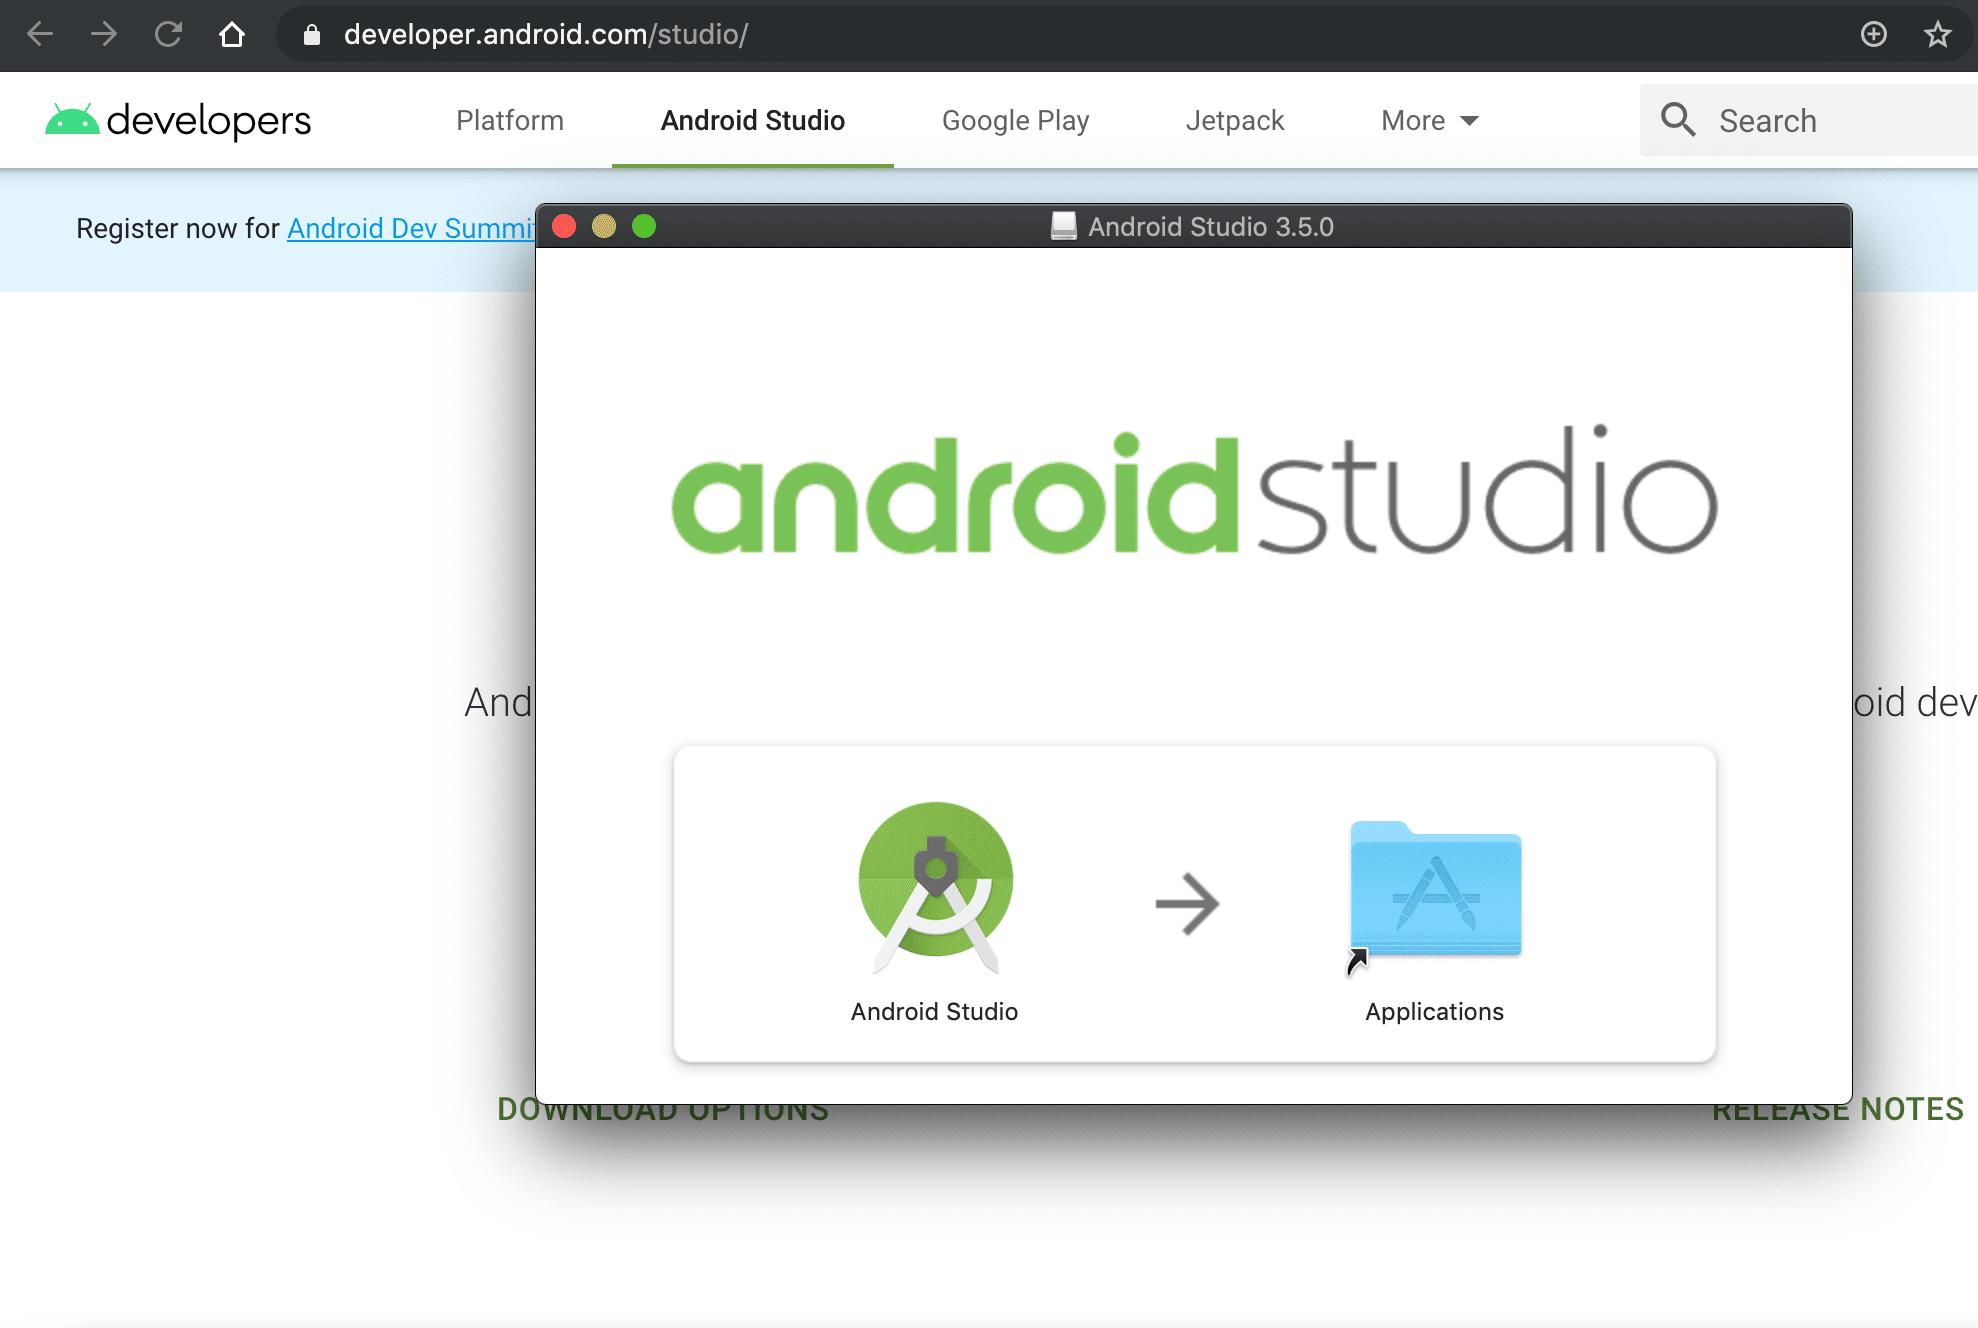 screenshot of Android Studio macOS disk image